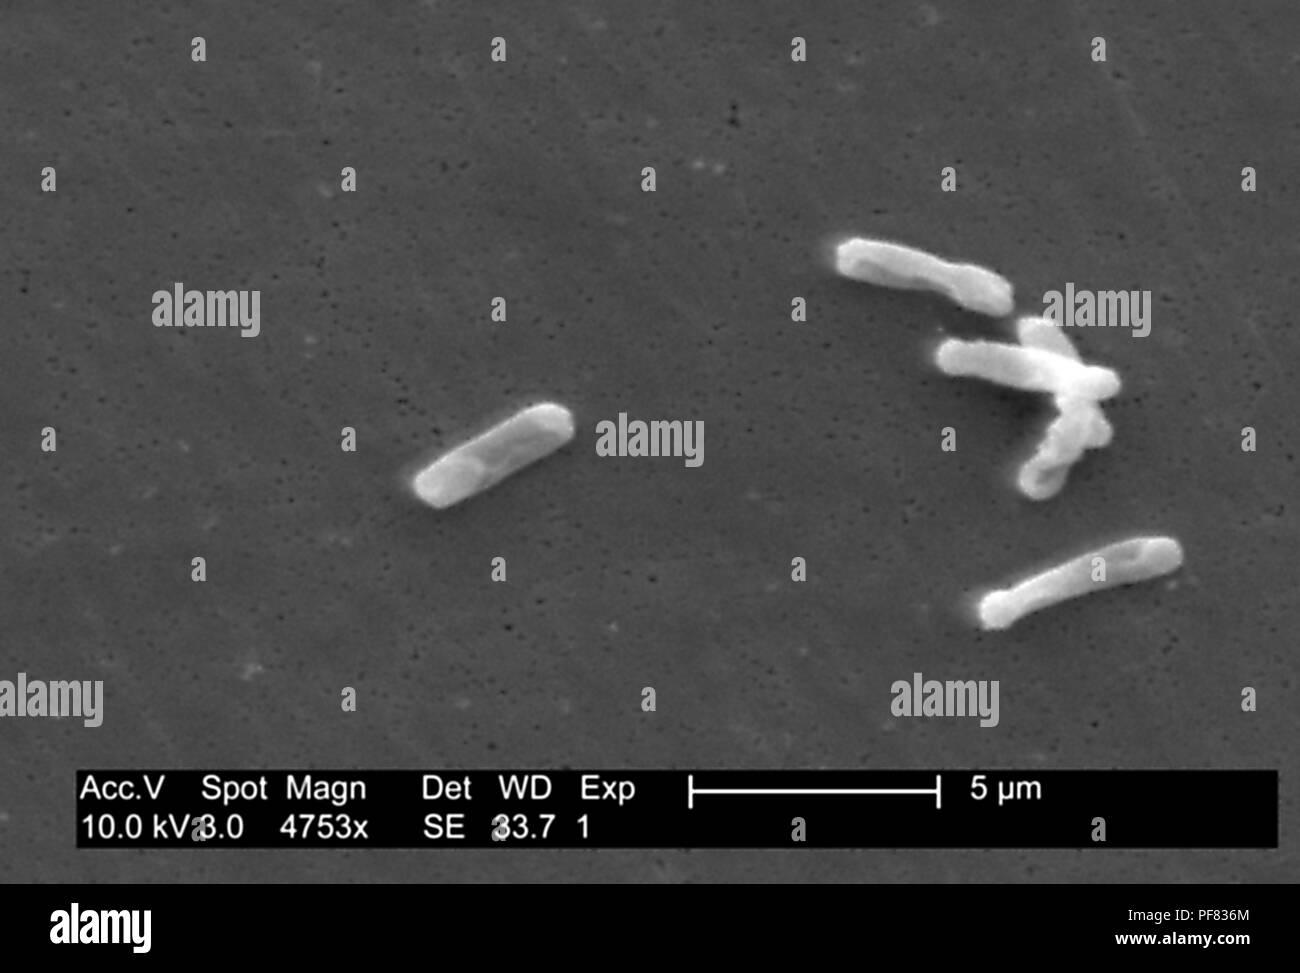 Gram Positive Bakterien Clostridium Difficile In Der Stuhlprobe